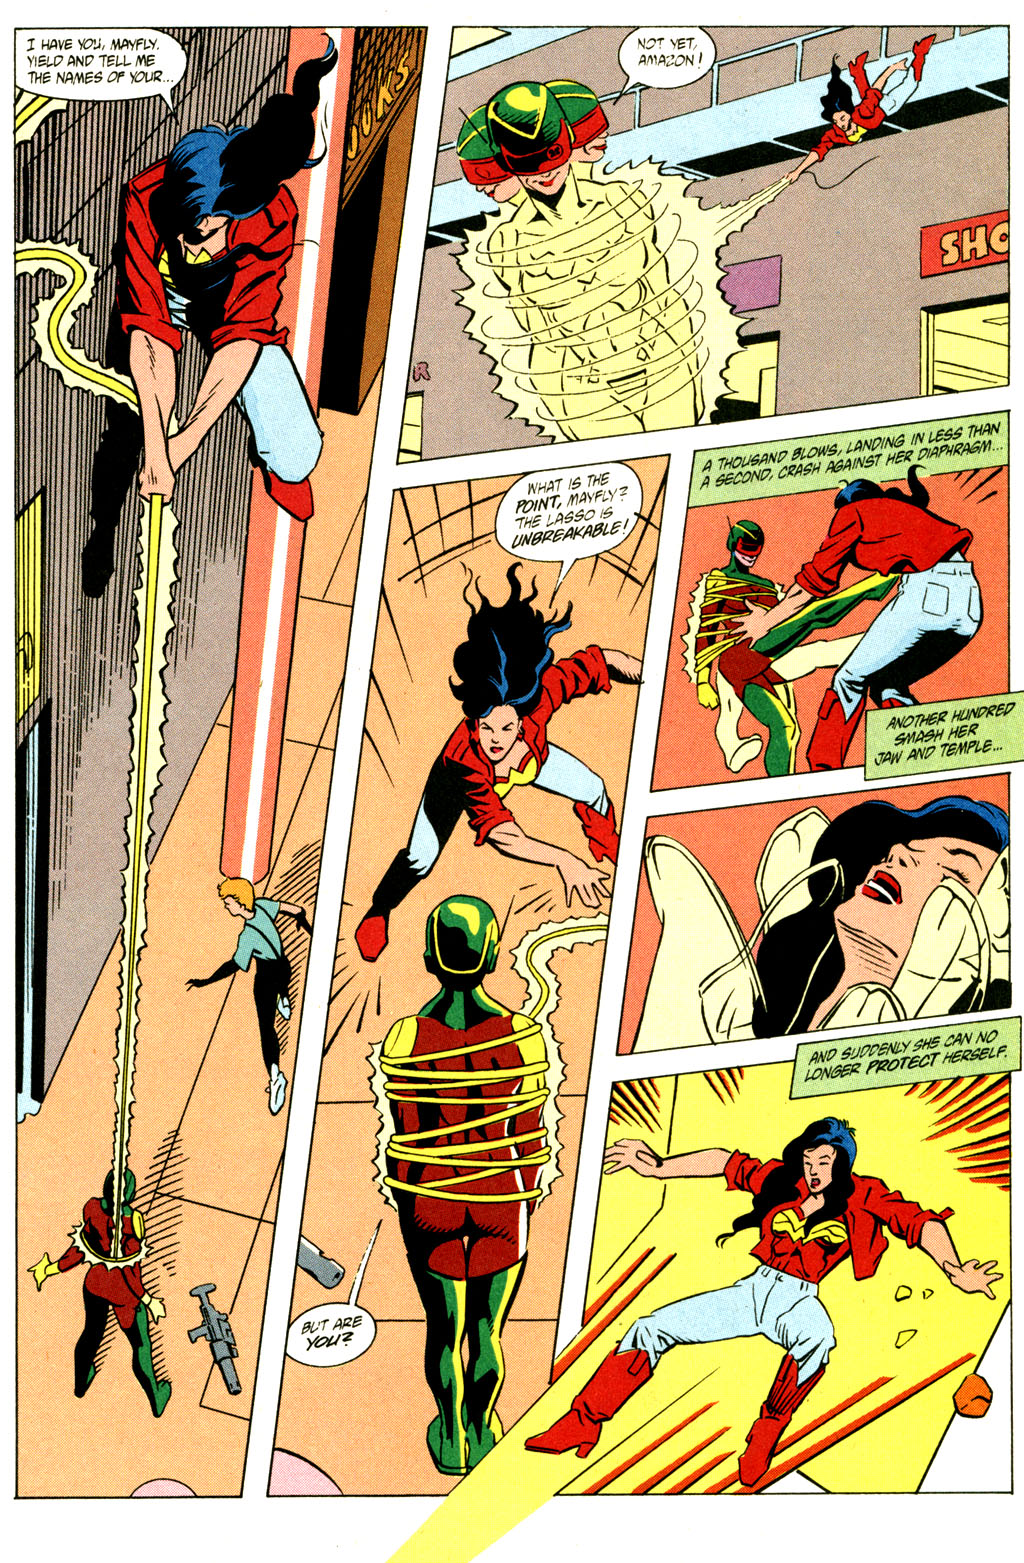 Read online Wonder Woman (1987) comic -  Issue #79 - 9